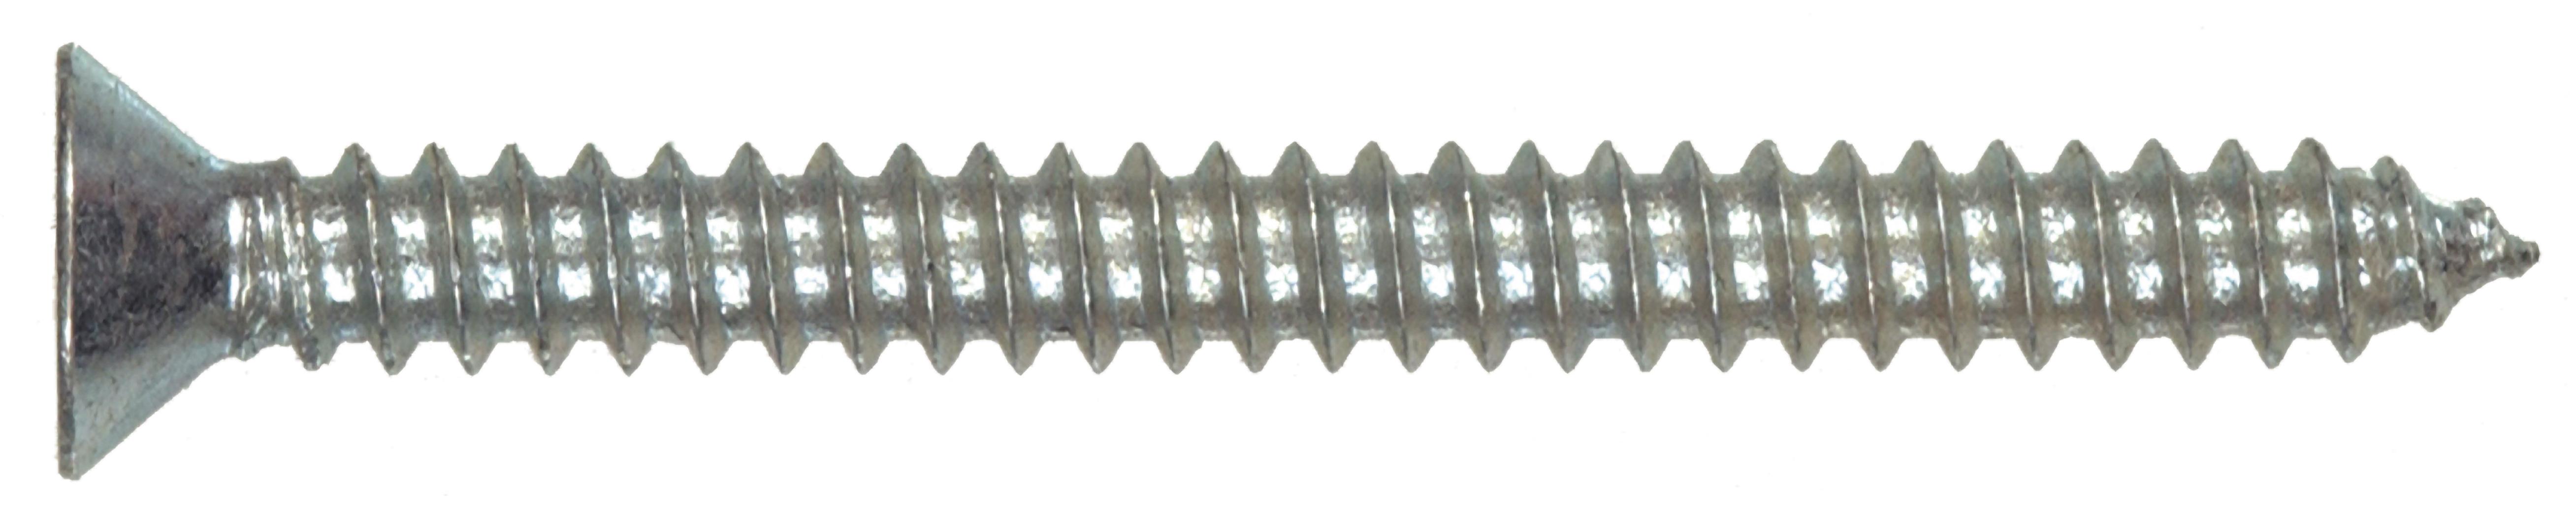 The Hillman Group 80168 6 x1-Inch Flat Head Phillips Sheet Metal Screw 100-Pack